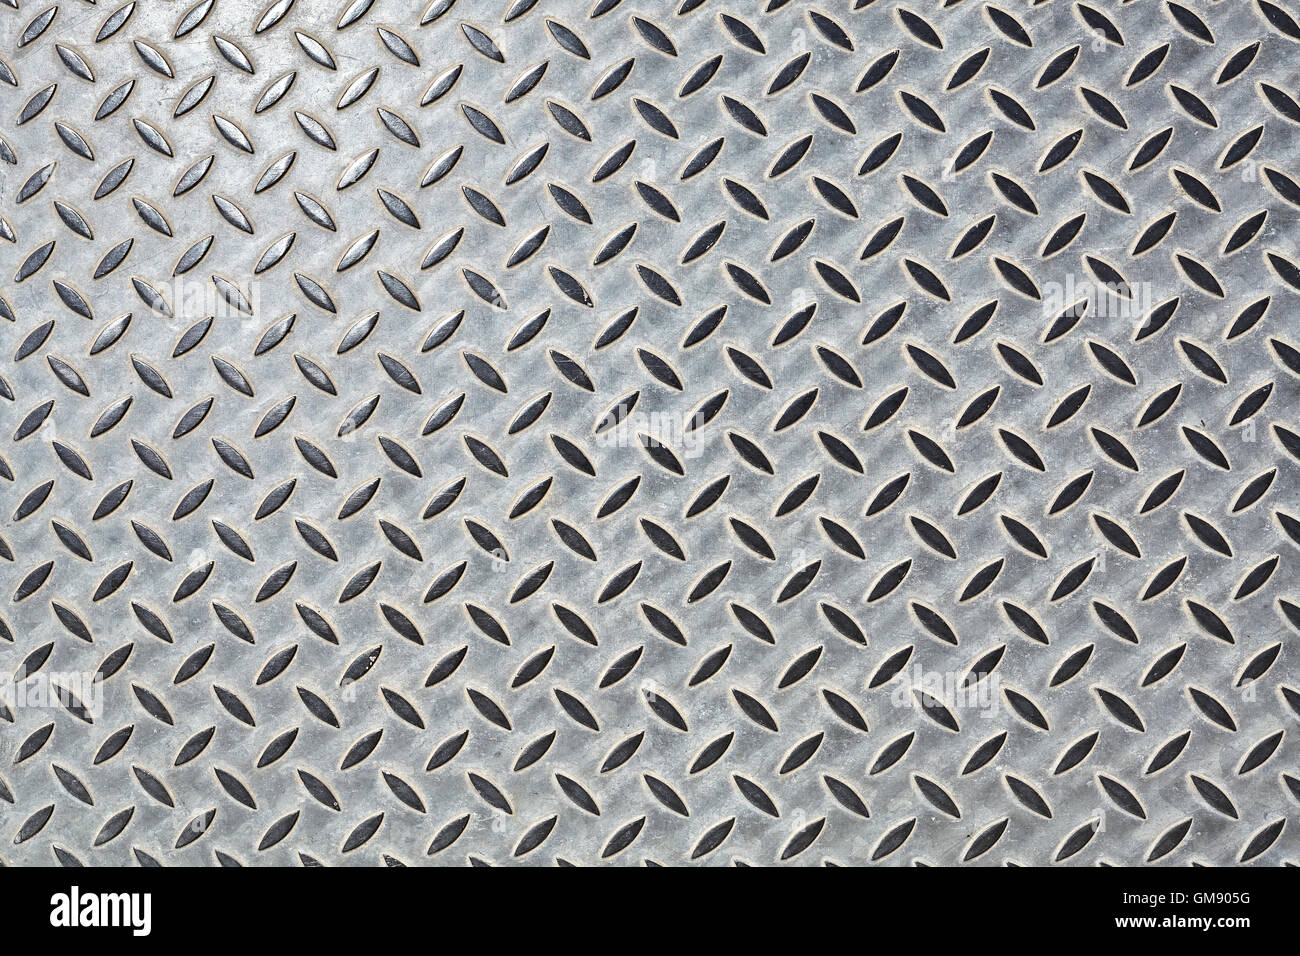 Piso de acero, patrón de fondo o textura. Foto de stock